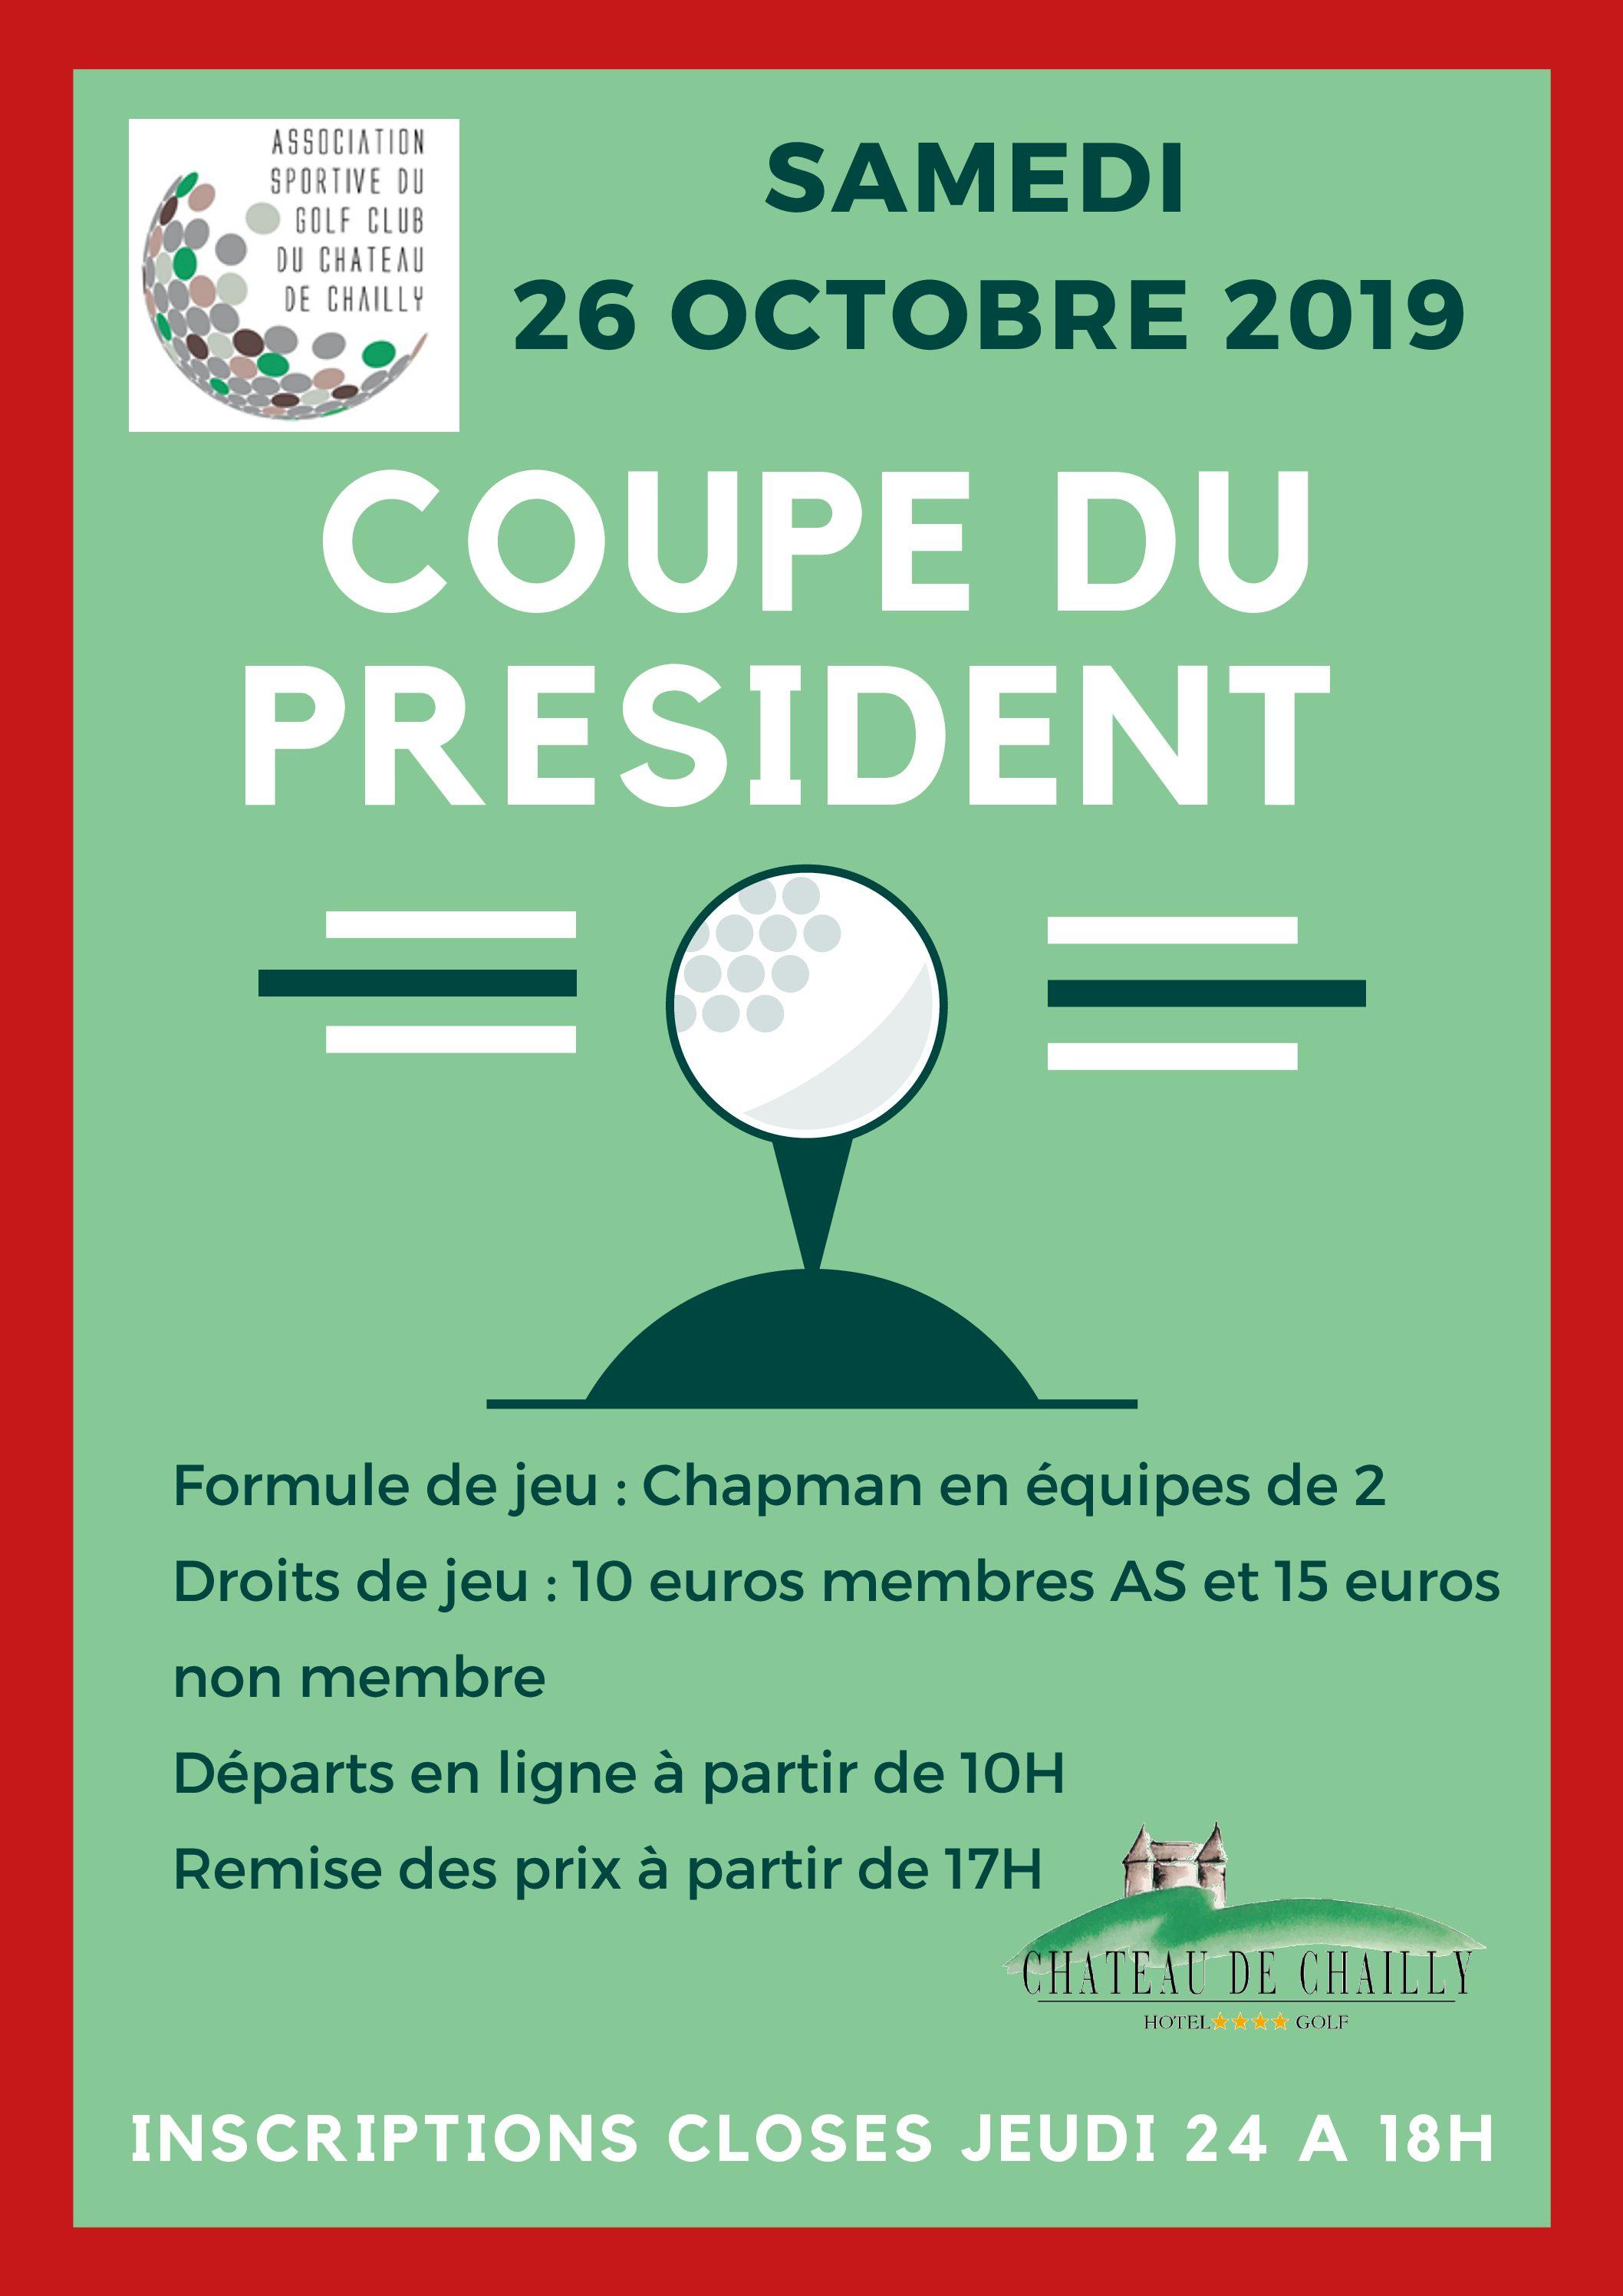 Coupe du président – samedi 26 octobre 2019